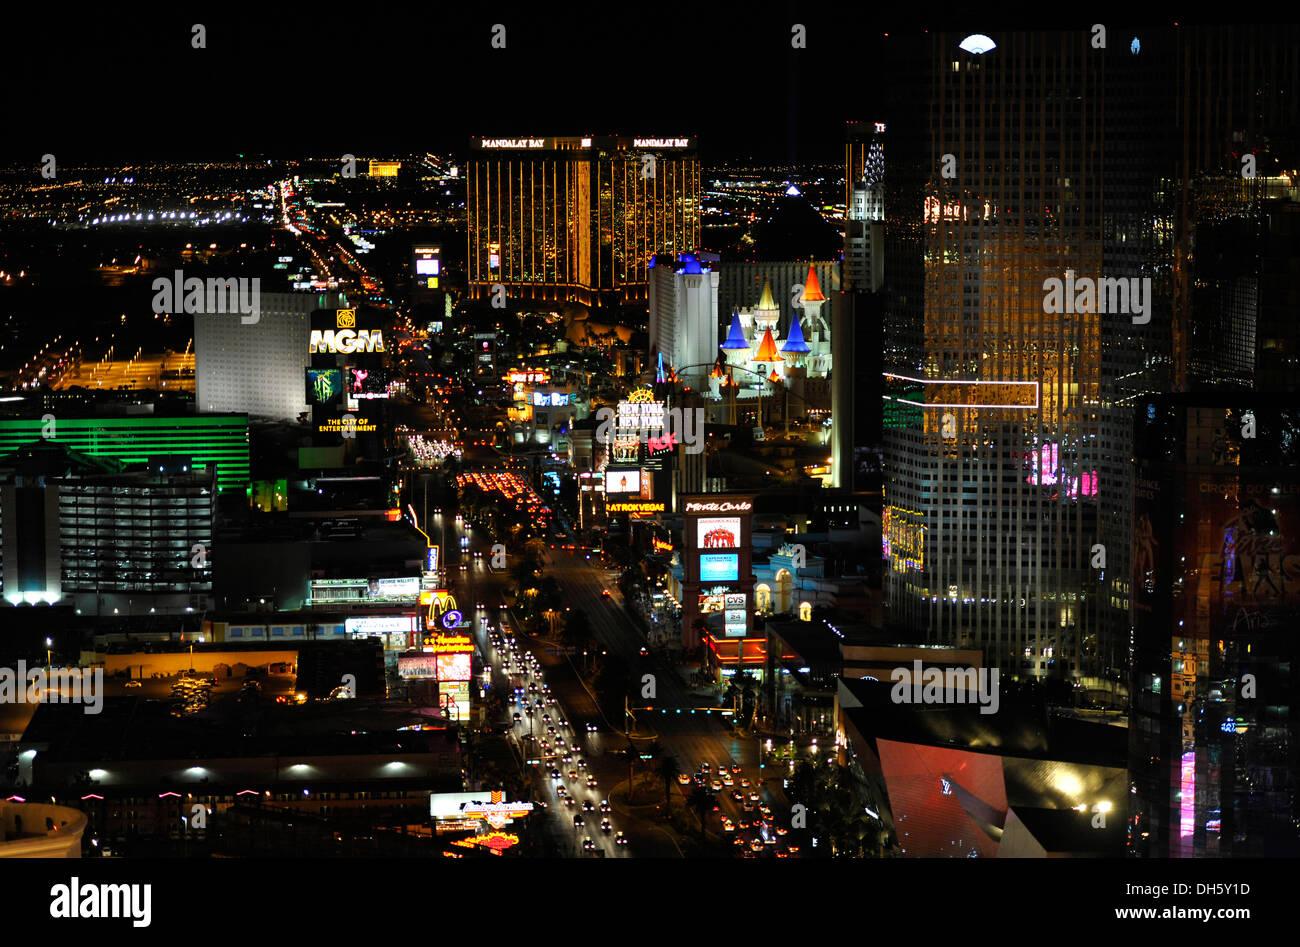 Night scene, The Strip, MGM Grand luxury hotel, New York, Mandalay Bay, Excalibur, Las Vegas, Nevada, United States of America - Stock Image